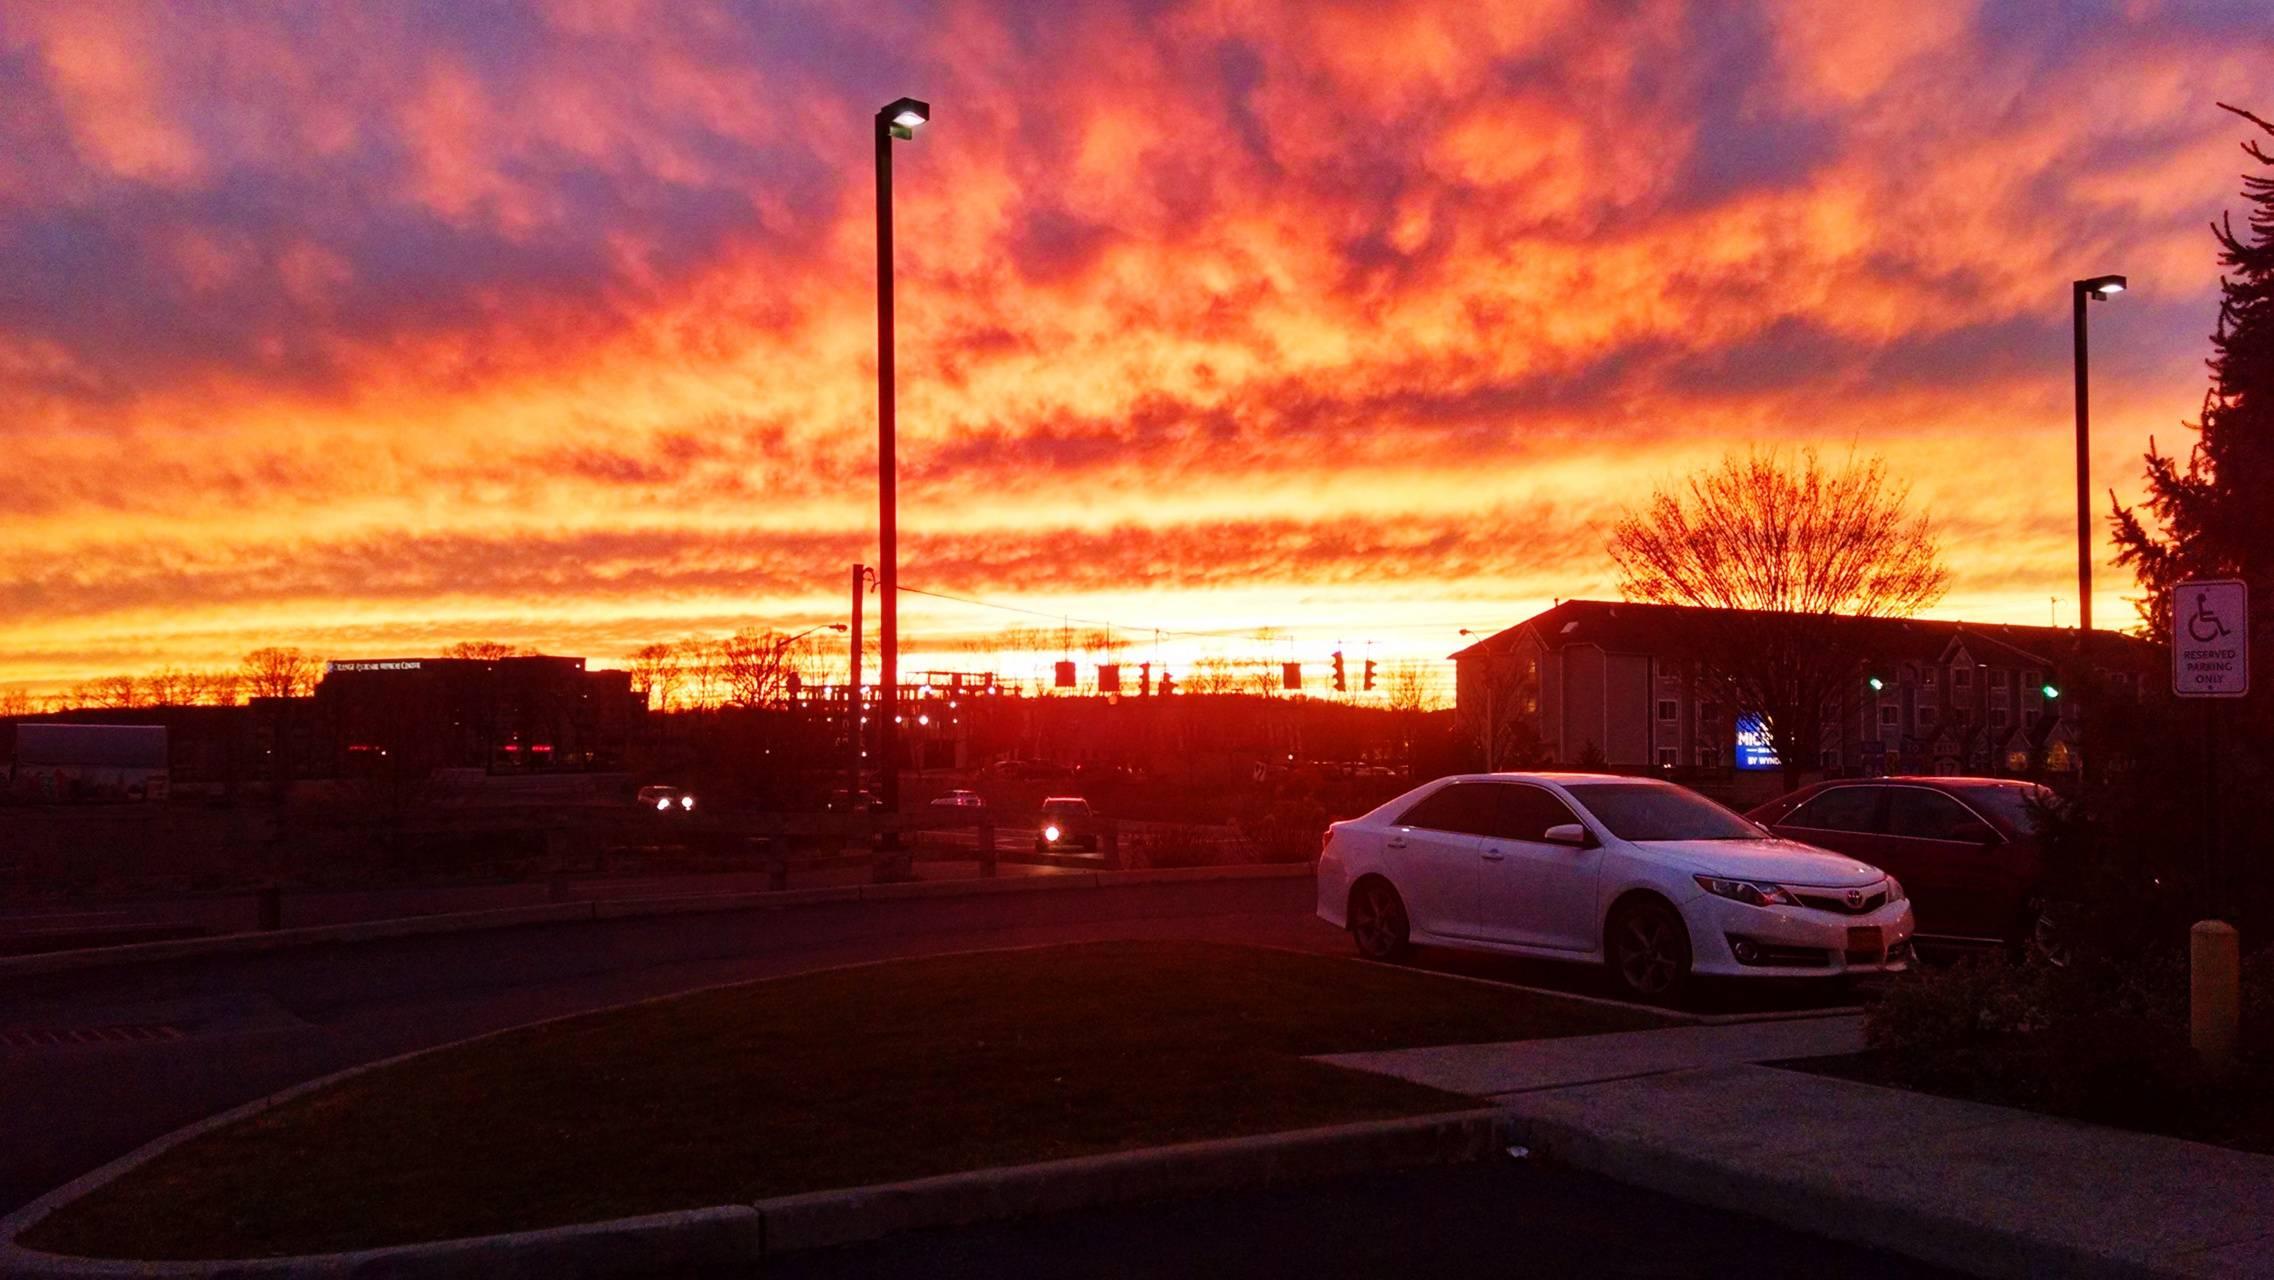 Sunset in Newburgh